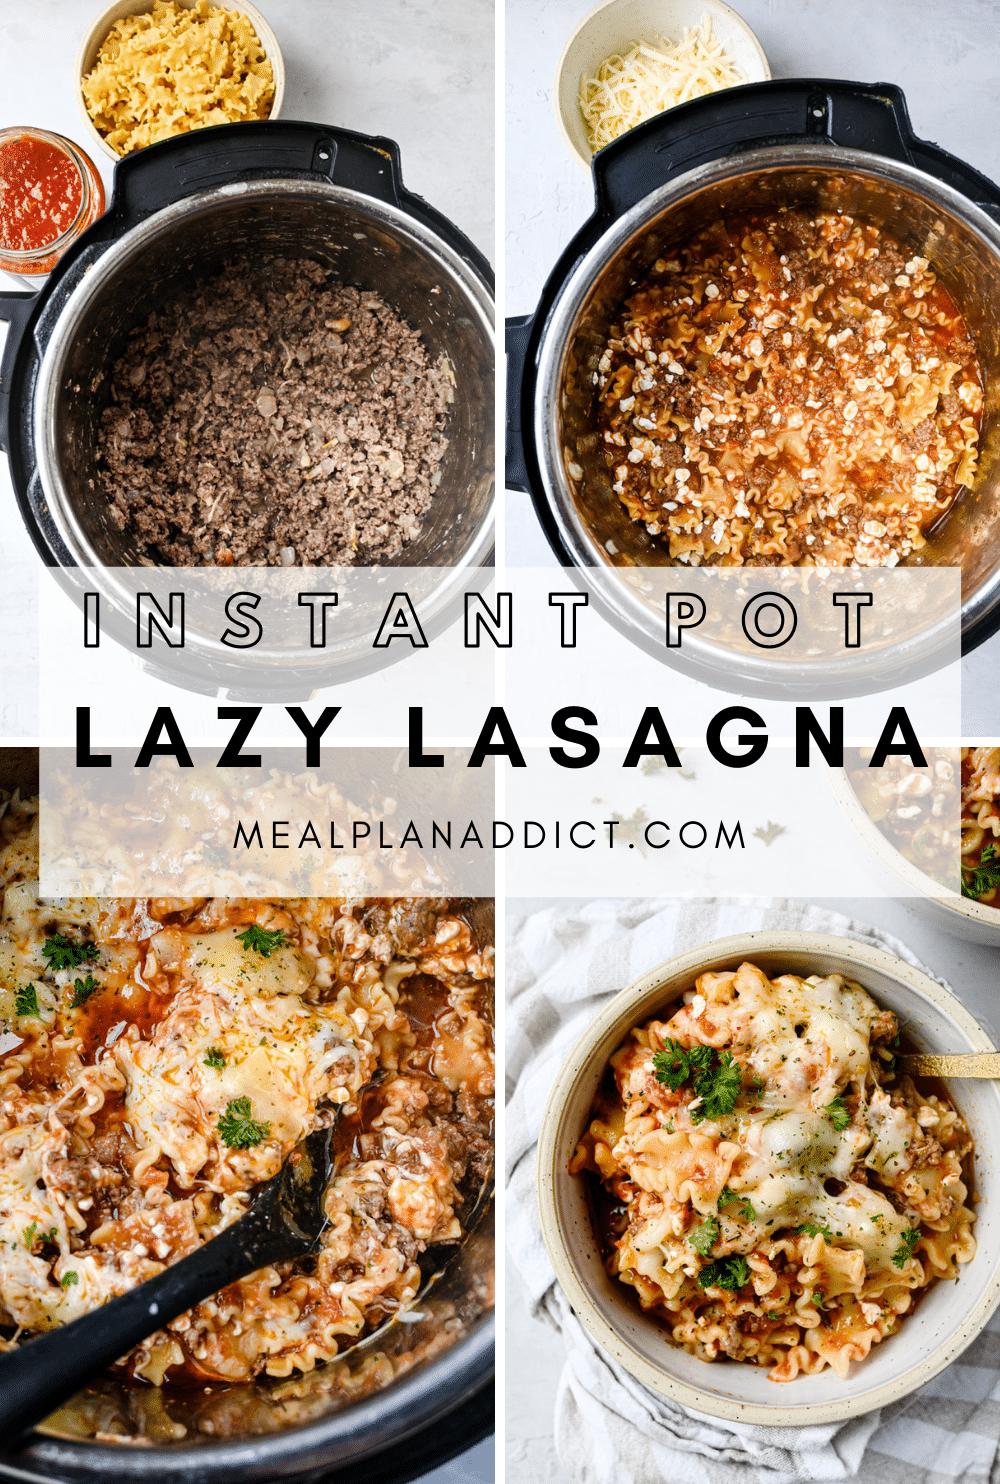 Easy Instant Pot Lazy Lasagna Recipe | Meal Plan Addict